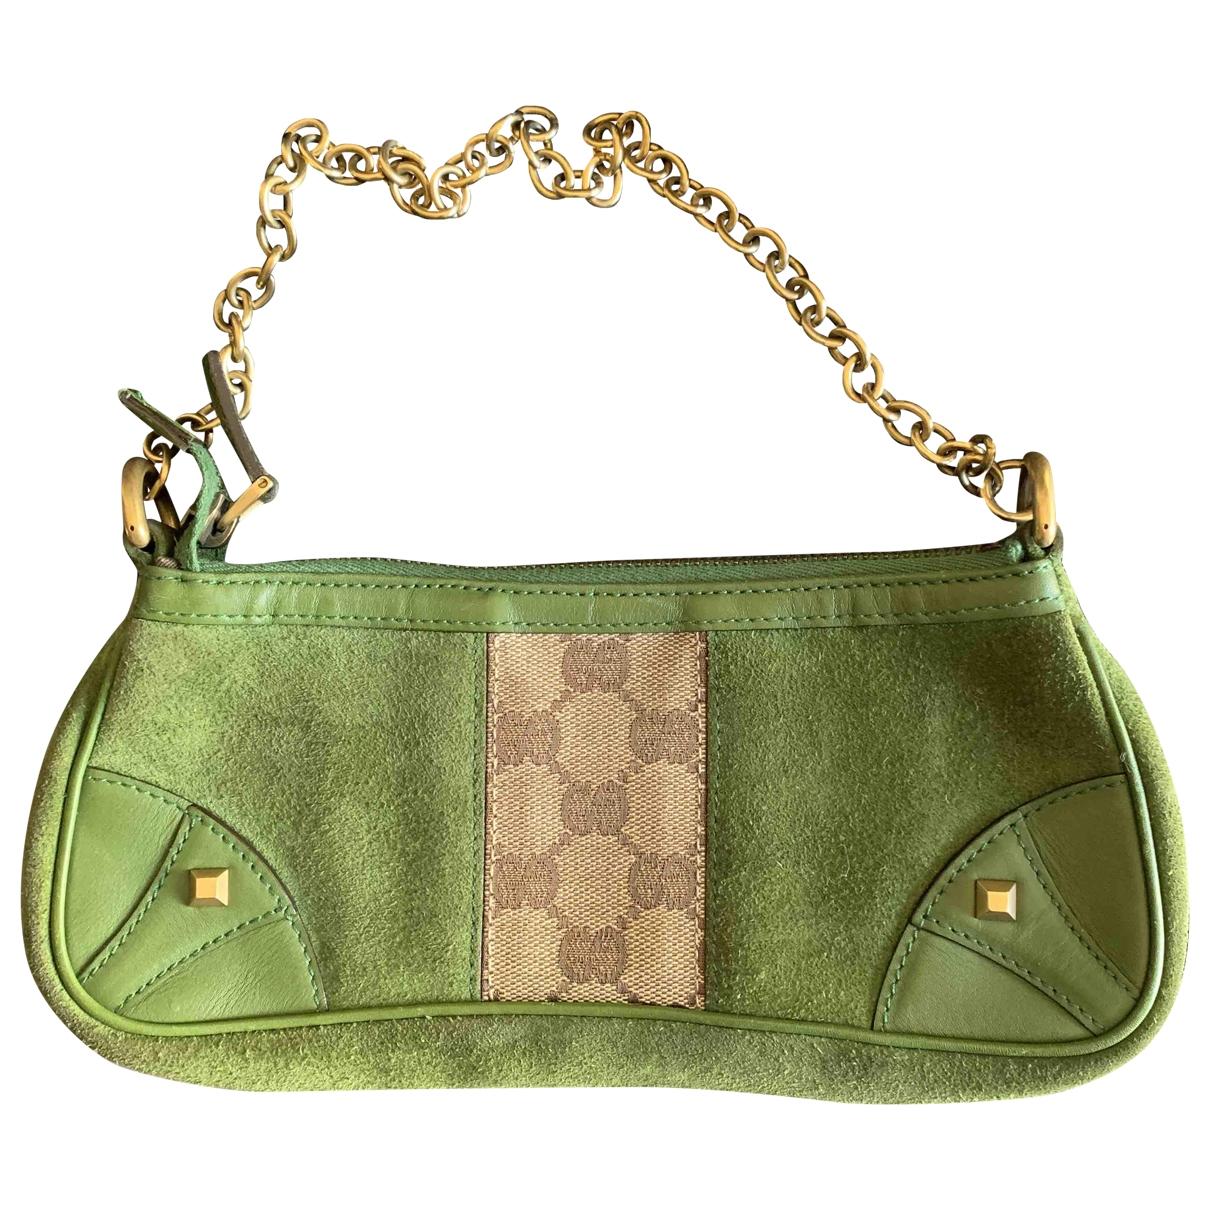 Gucci \N Green Leather Clutch bag for Women \N